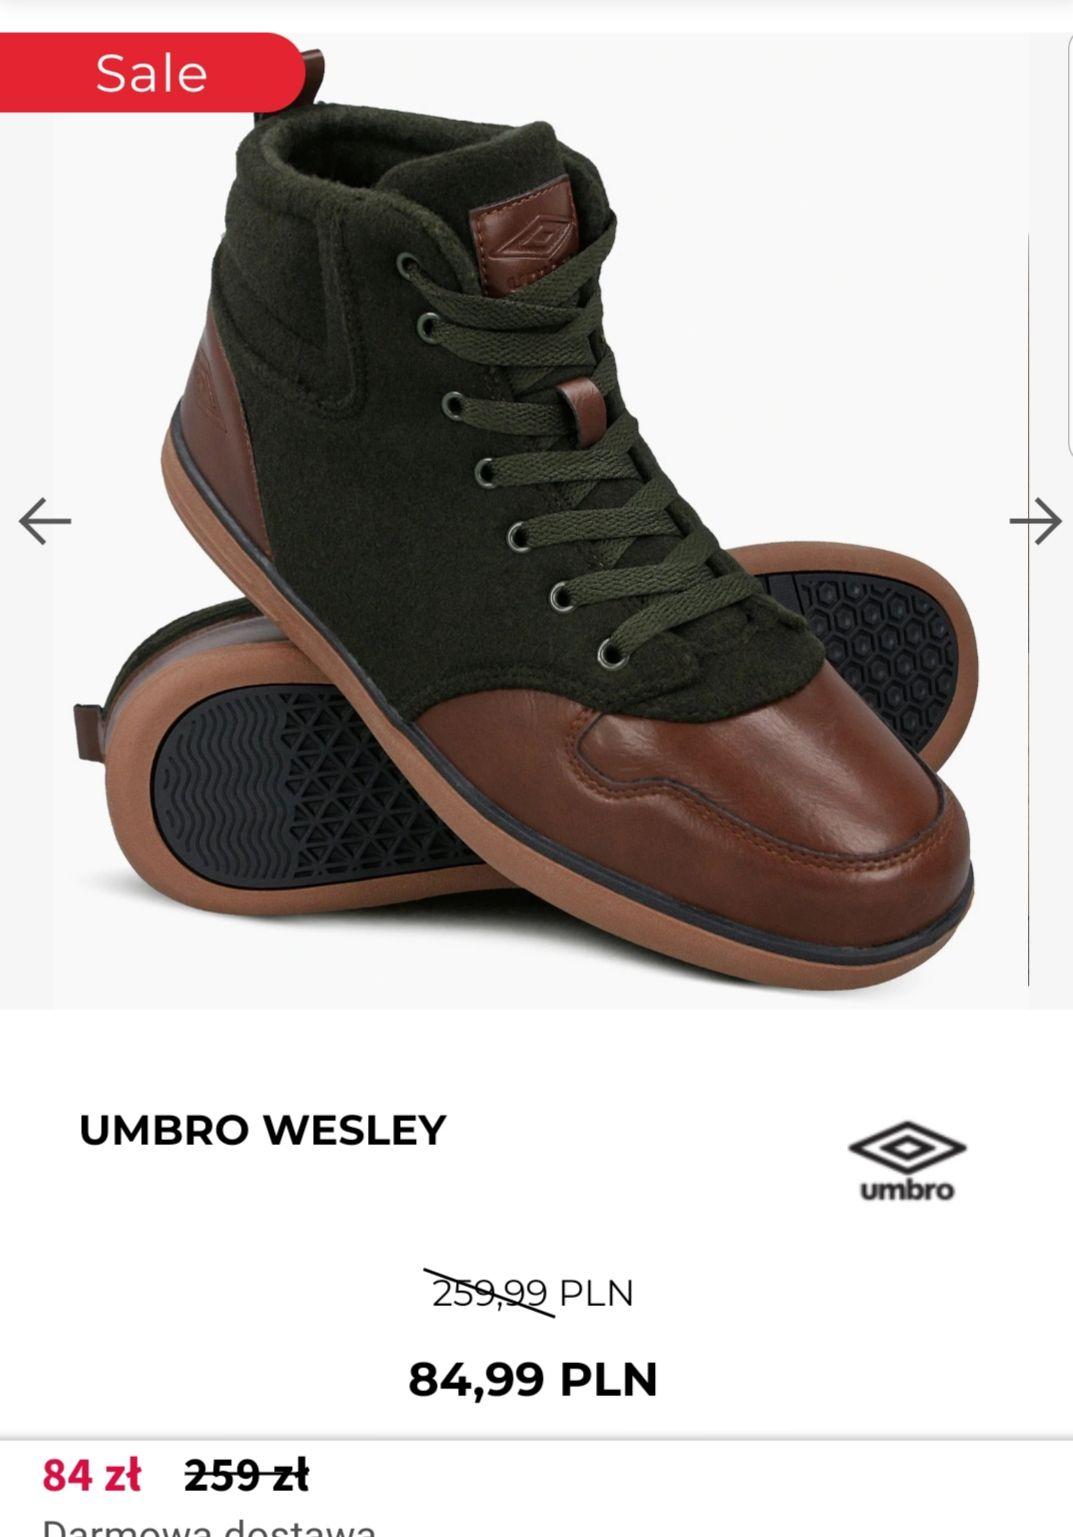 UMBRO WESLEY brązowe/czarne